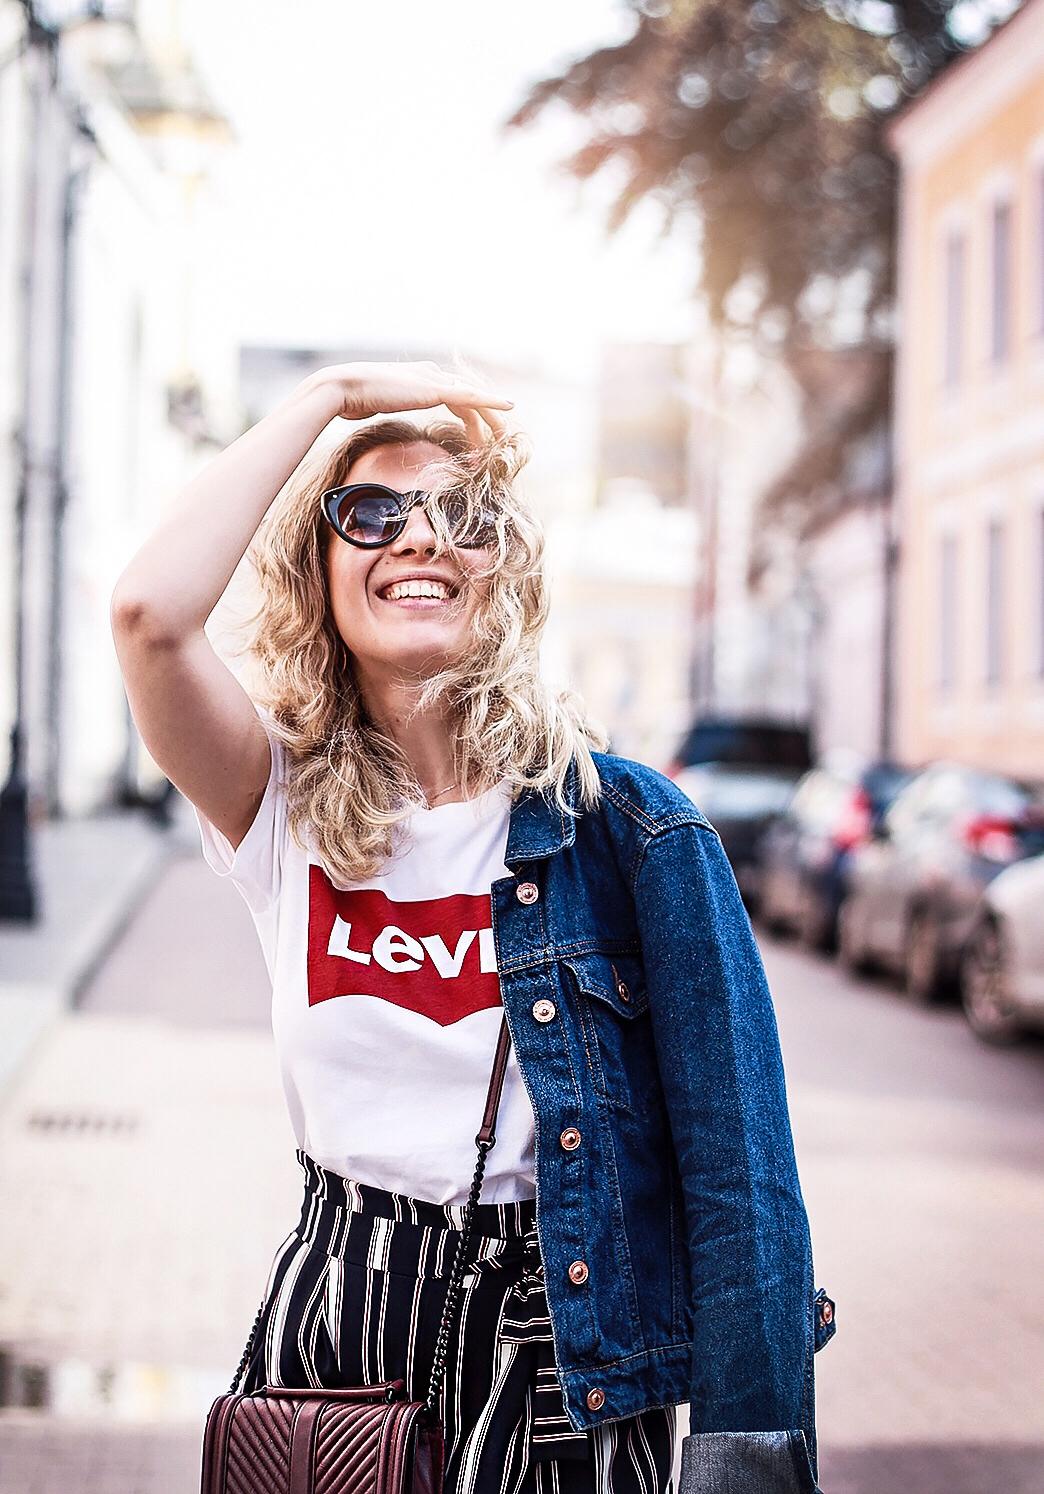 https://1.bp.blogspot.com/-kn9lYk_qUpY/WVk1_wYAFfI/AAAAAAAASm4/oMk3piEQaN4qxd5kE0uh8v7dDOSdOWBcgCLcBGAs/s1600/Rita_maslova_Levis_shirt_denim_jacket_zara_stryped_culottes_marsala_heels_russian_fashion_blogger_streetstyle_17.jpg